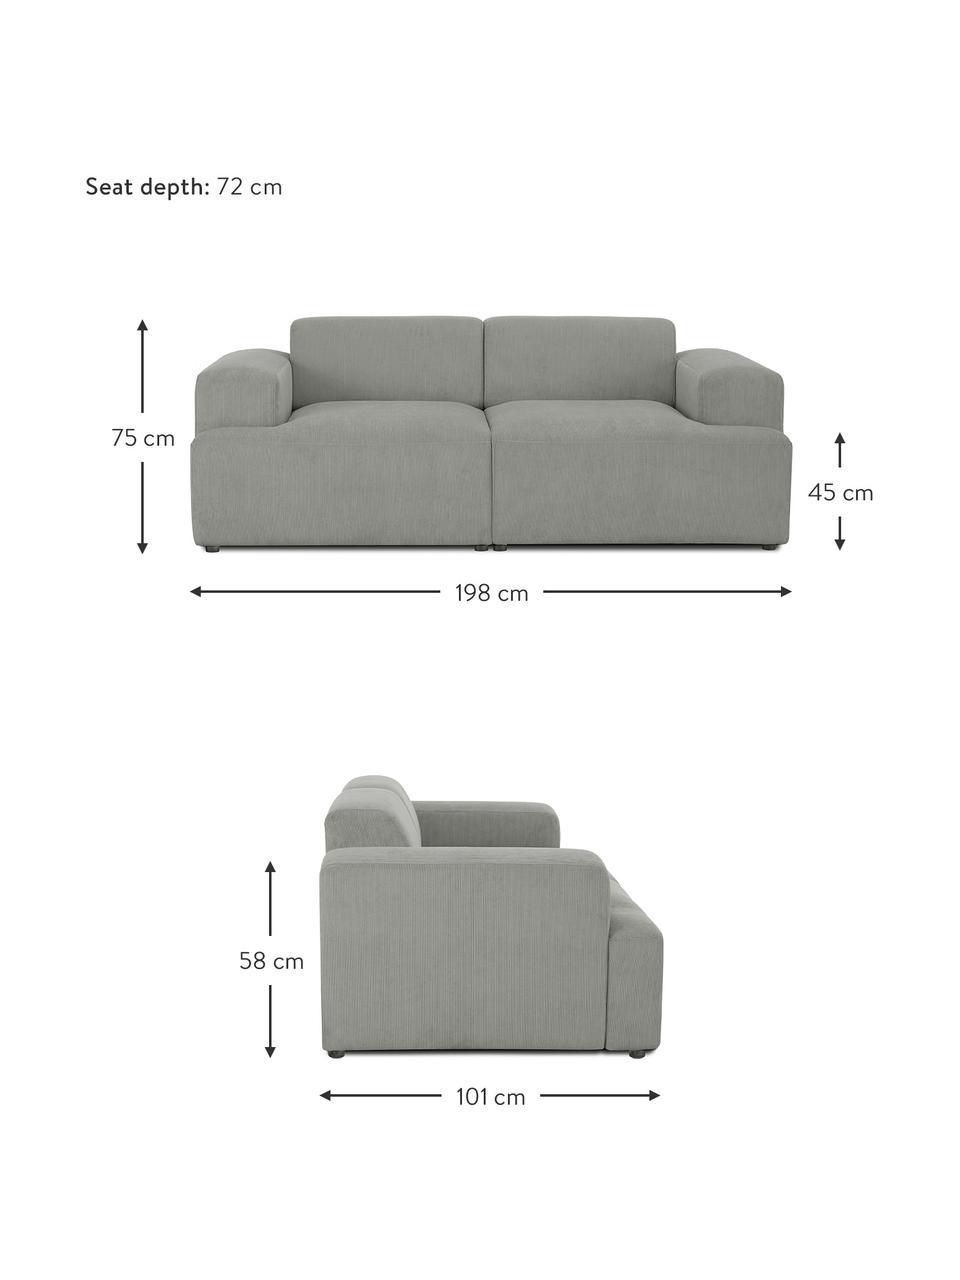 Cord-Sofa Melva (2-Sitzer) in Grau, Bezug: Cord (92% Polyester, 8% P, Gestell: Massives Kiefernholz, FSC, Füße: Kunststoff, Cord Grau, B 198 x T 101 cm